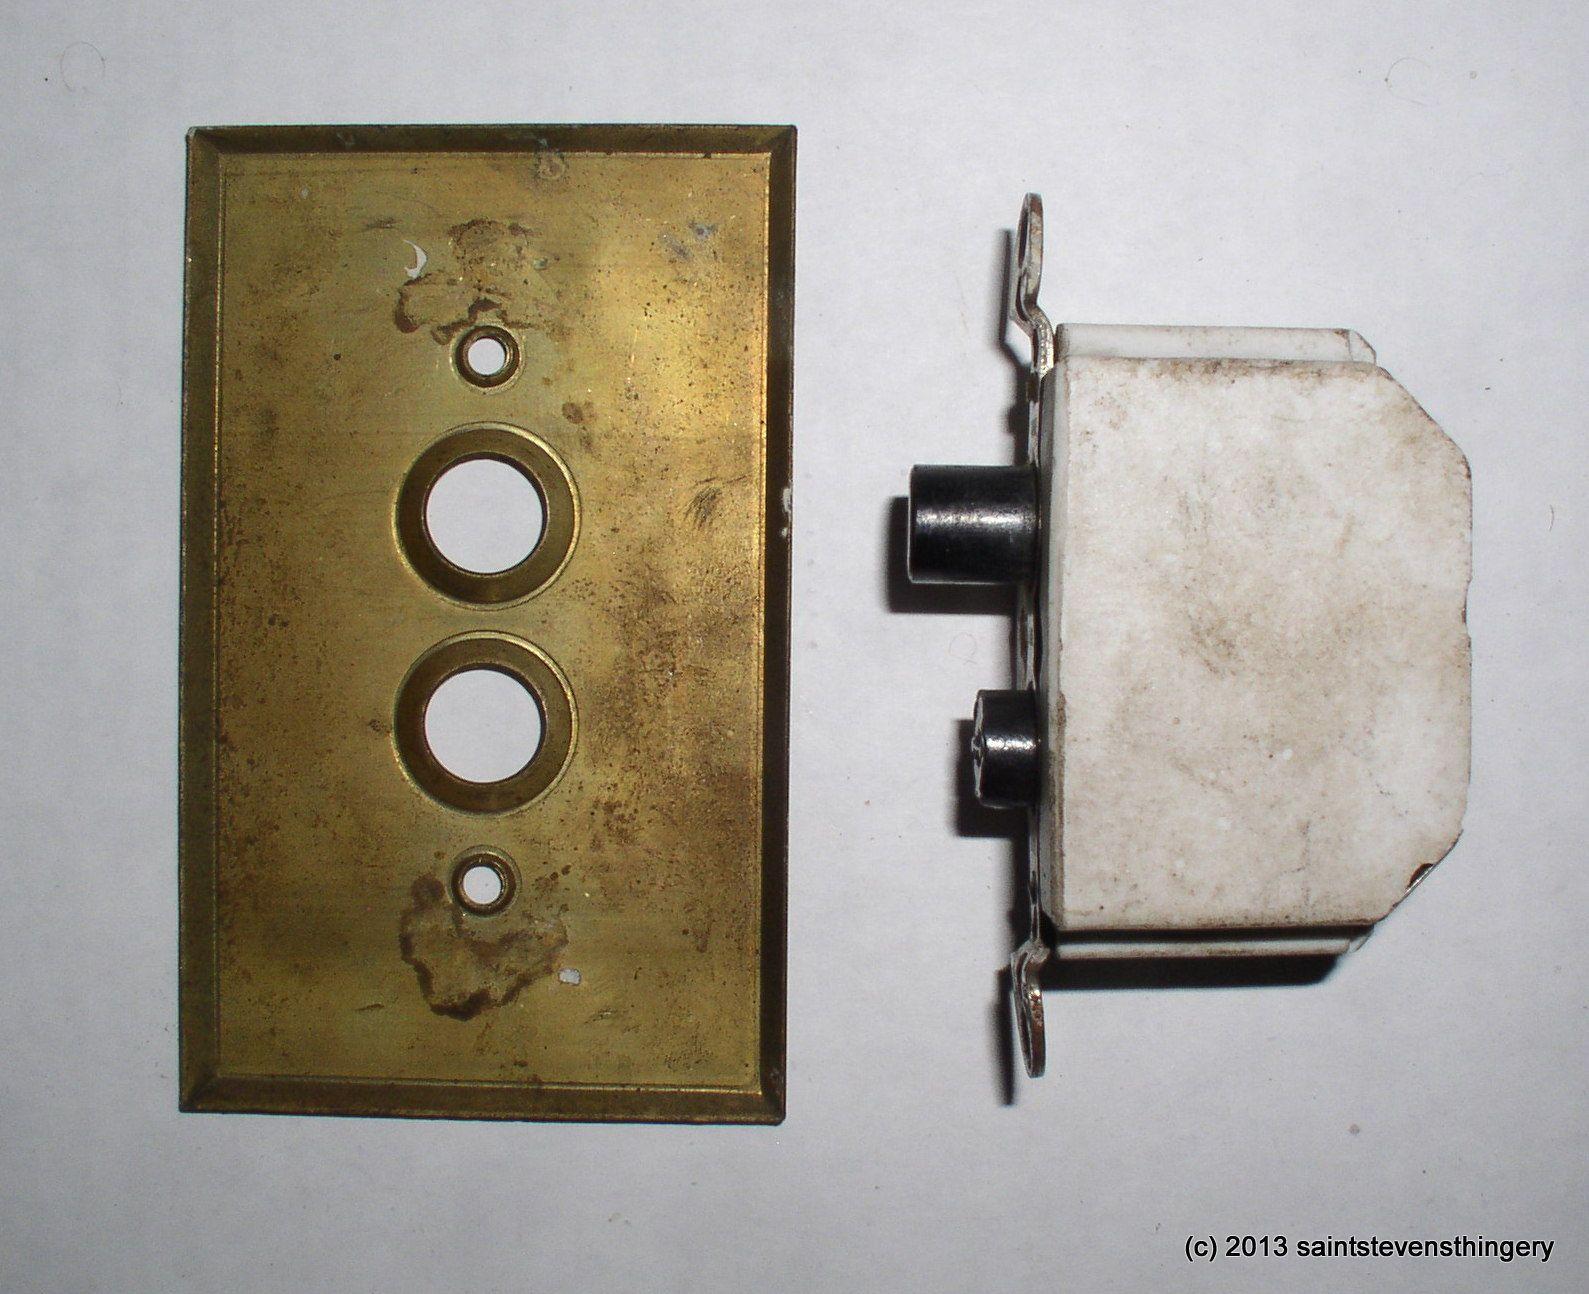 1918 Light Switches Vintage Arrow Push Button Light